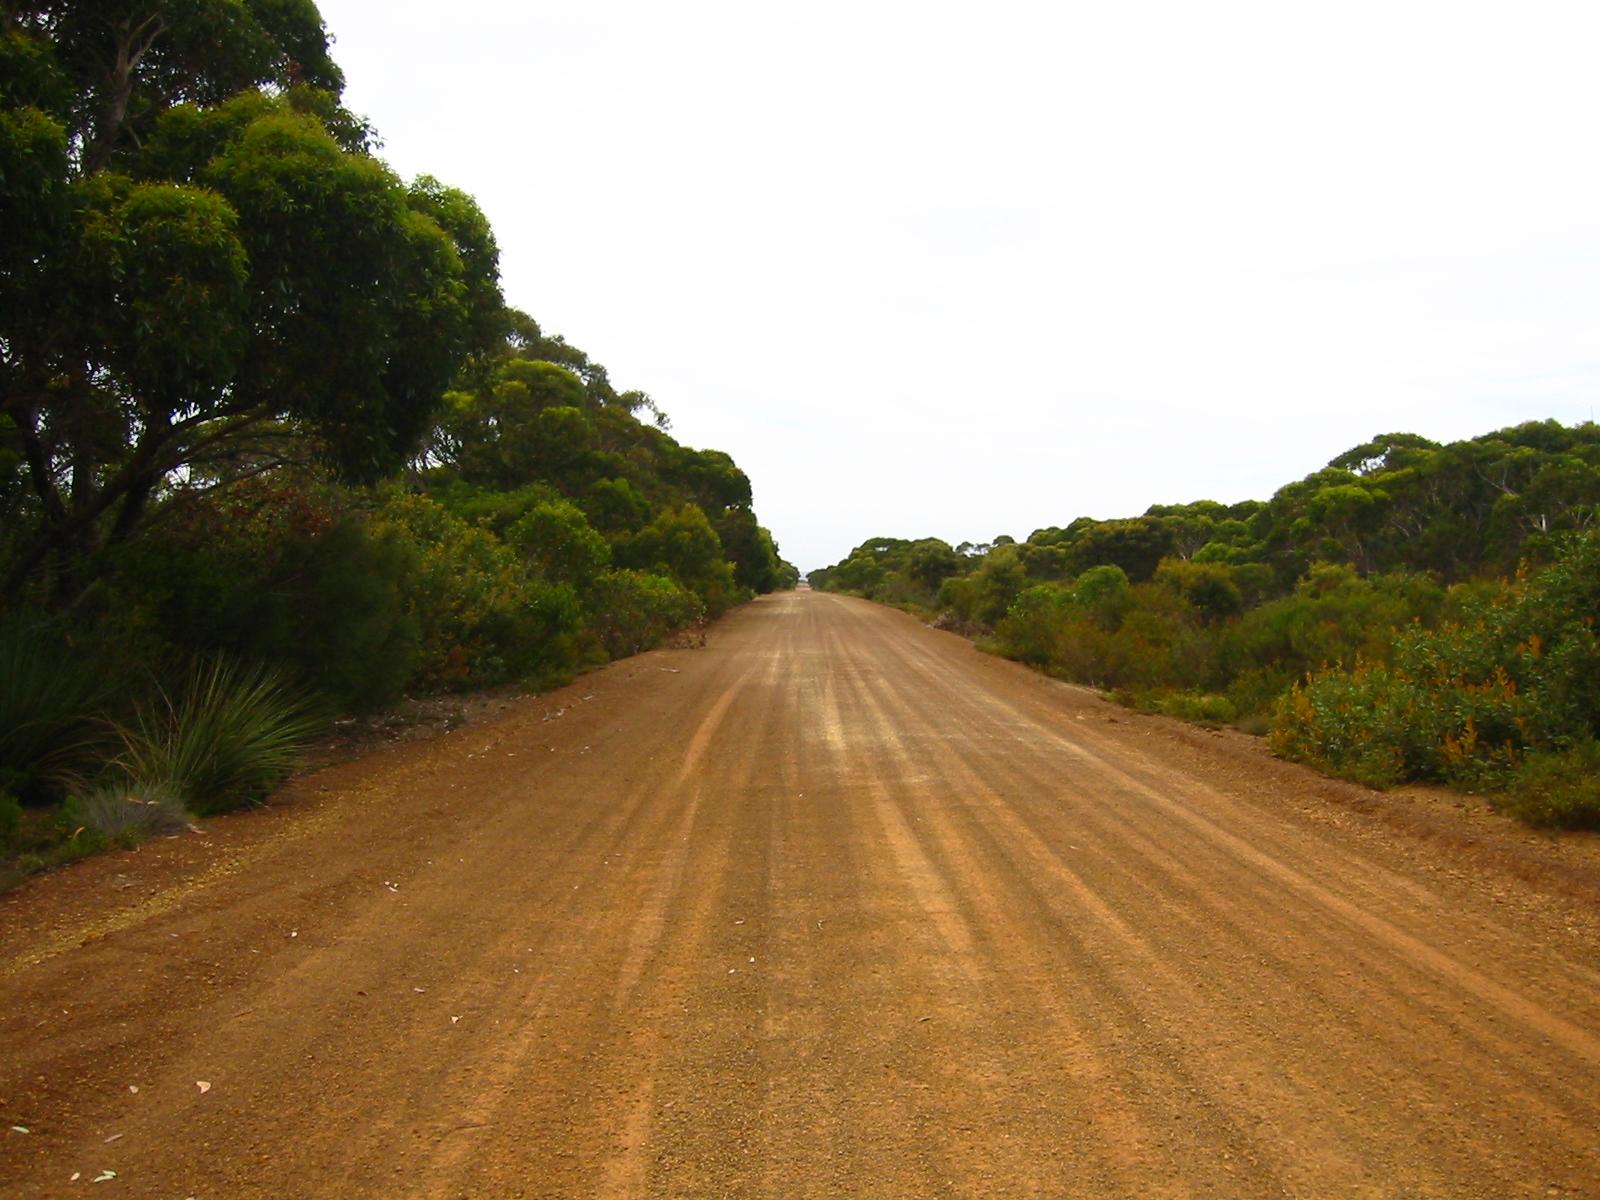 File:Dirt Road SA.JPG - Wikimedia Commons